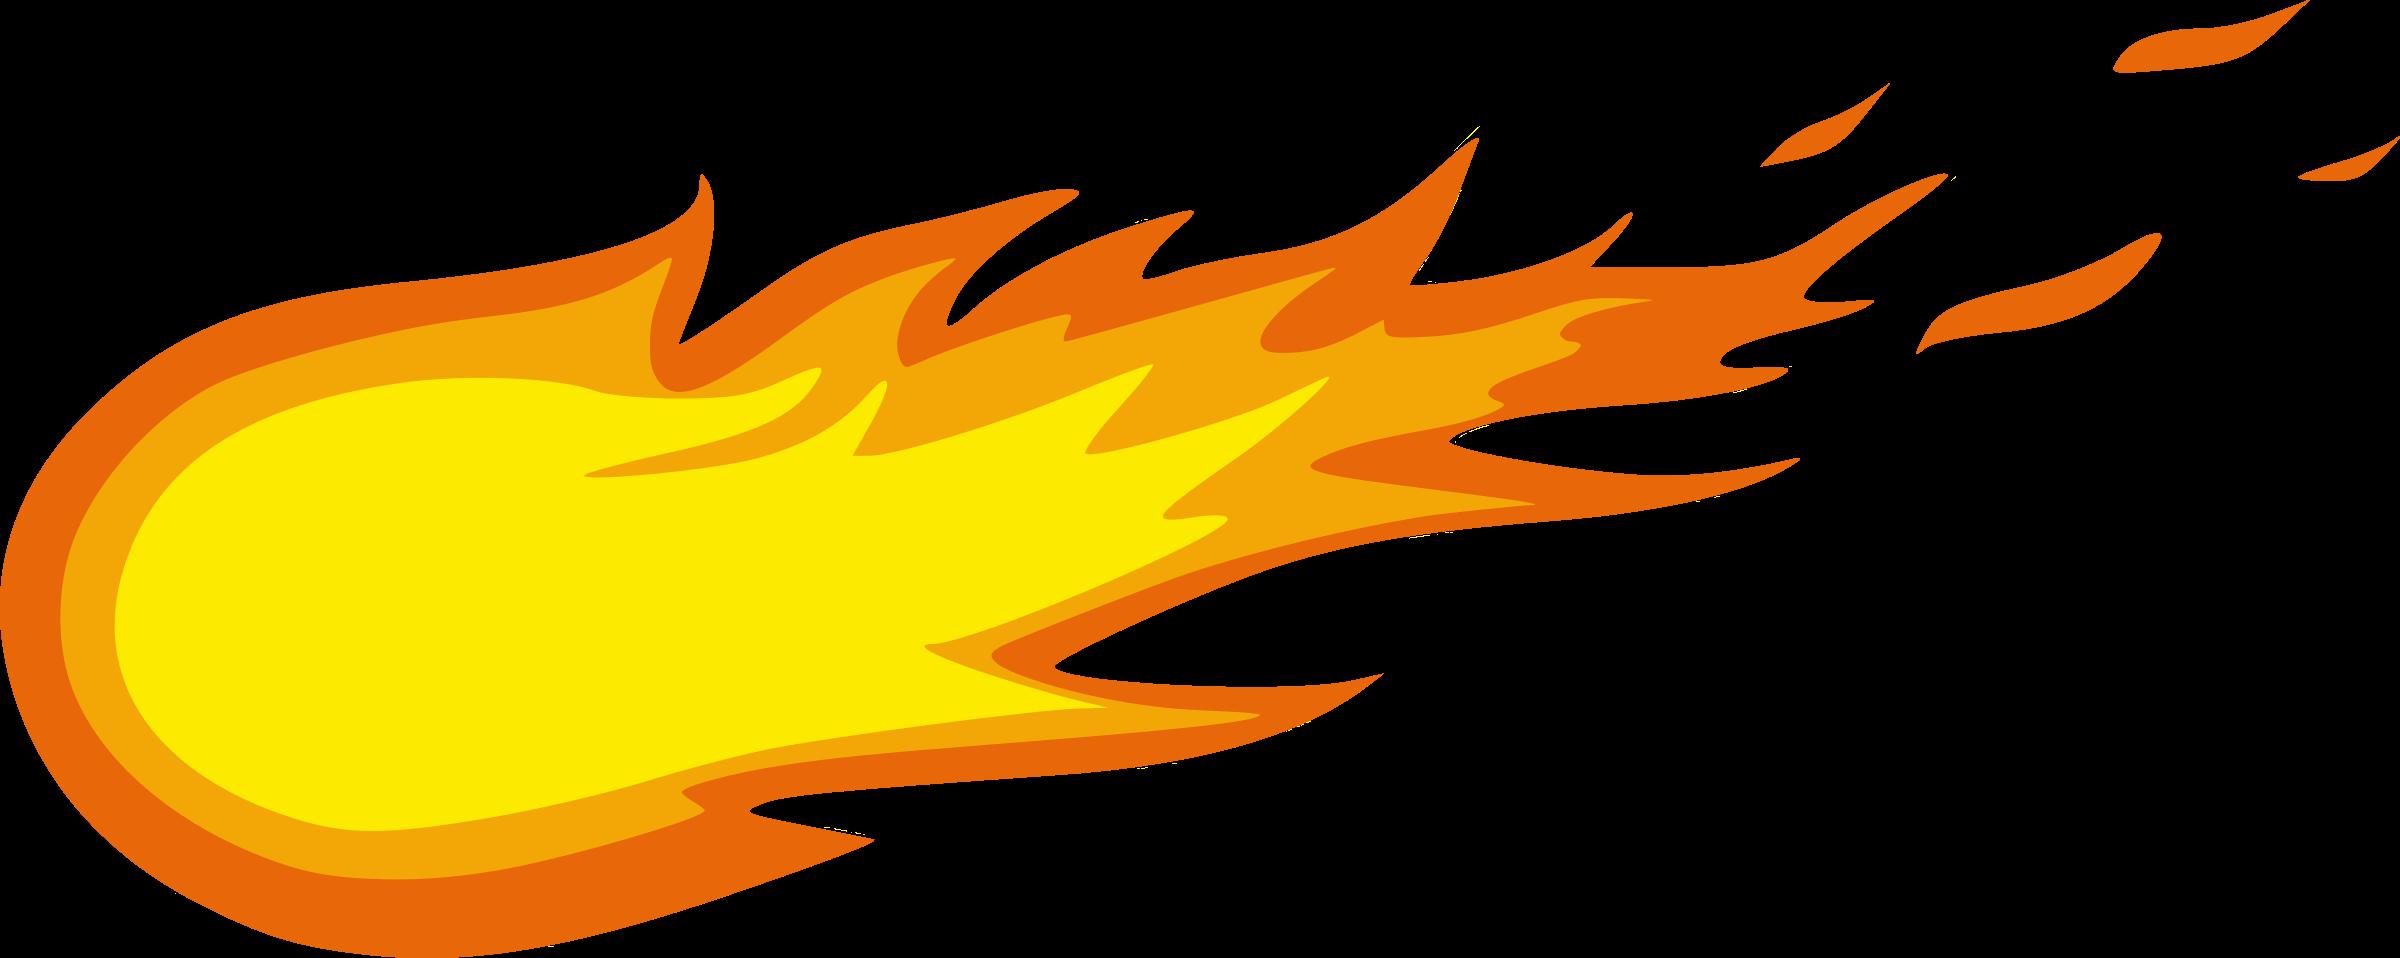 OnlineLabels Clip Art - Fireball |Shooting Flames Drawings